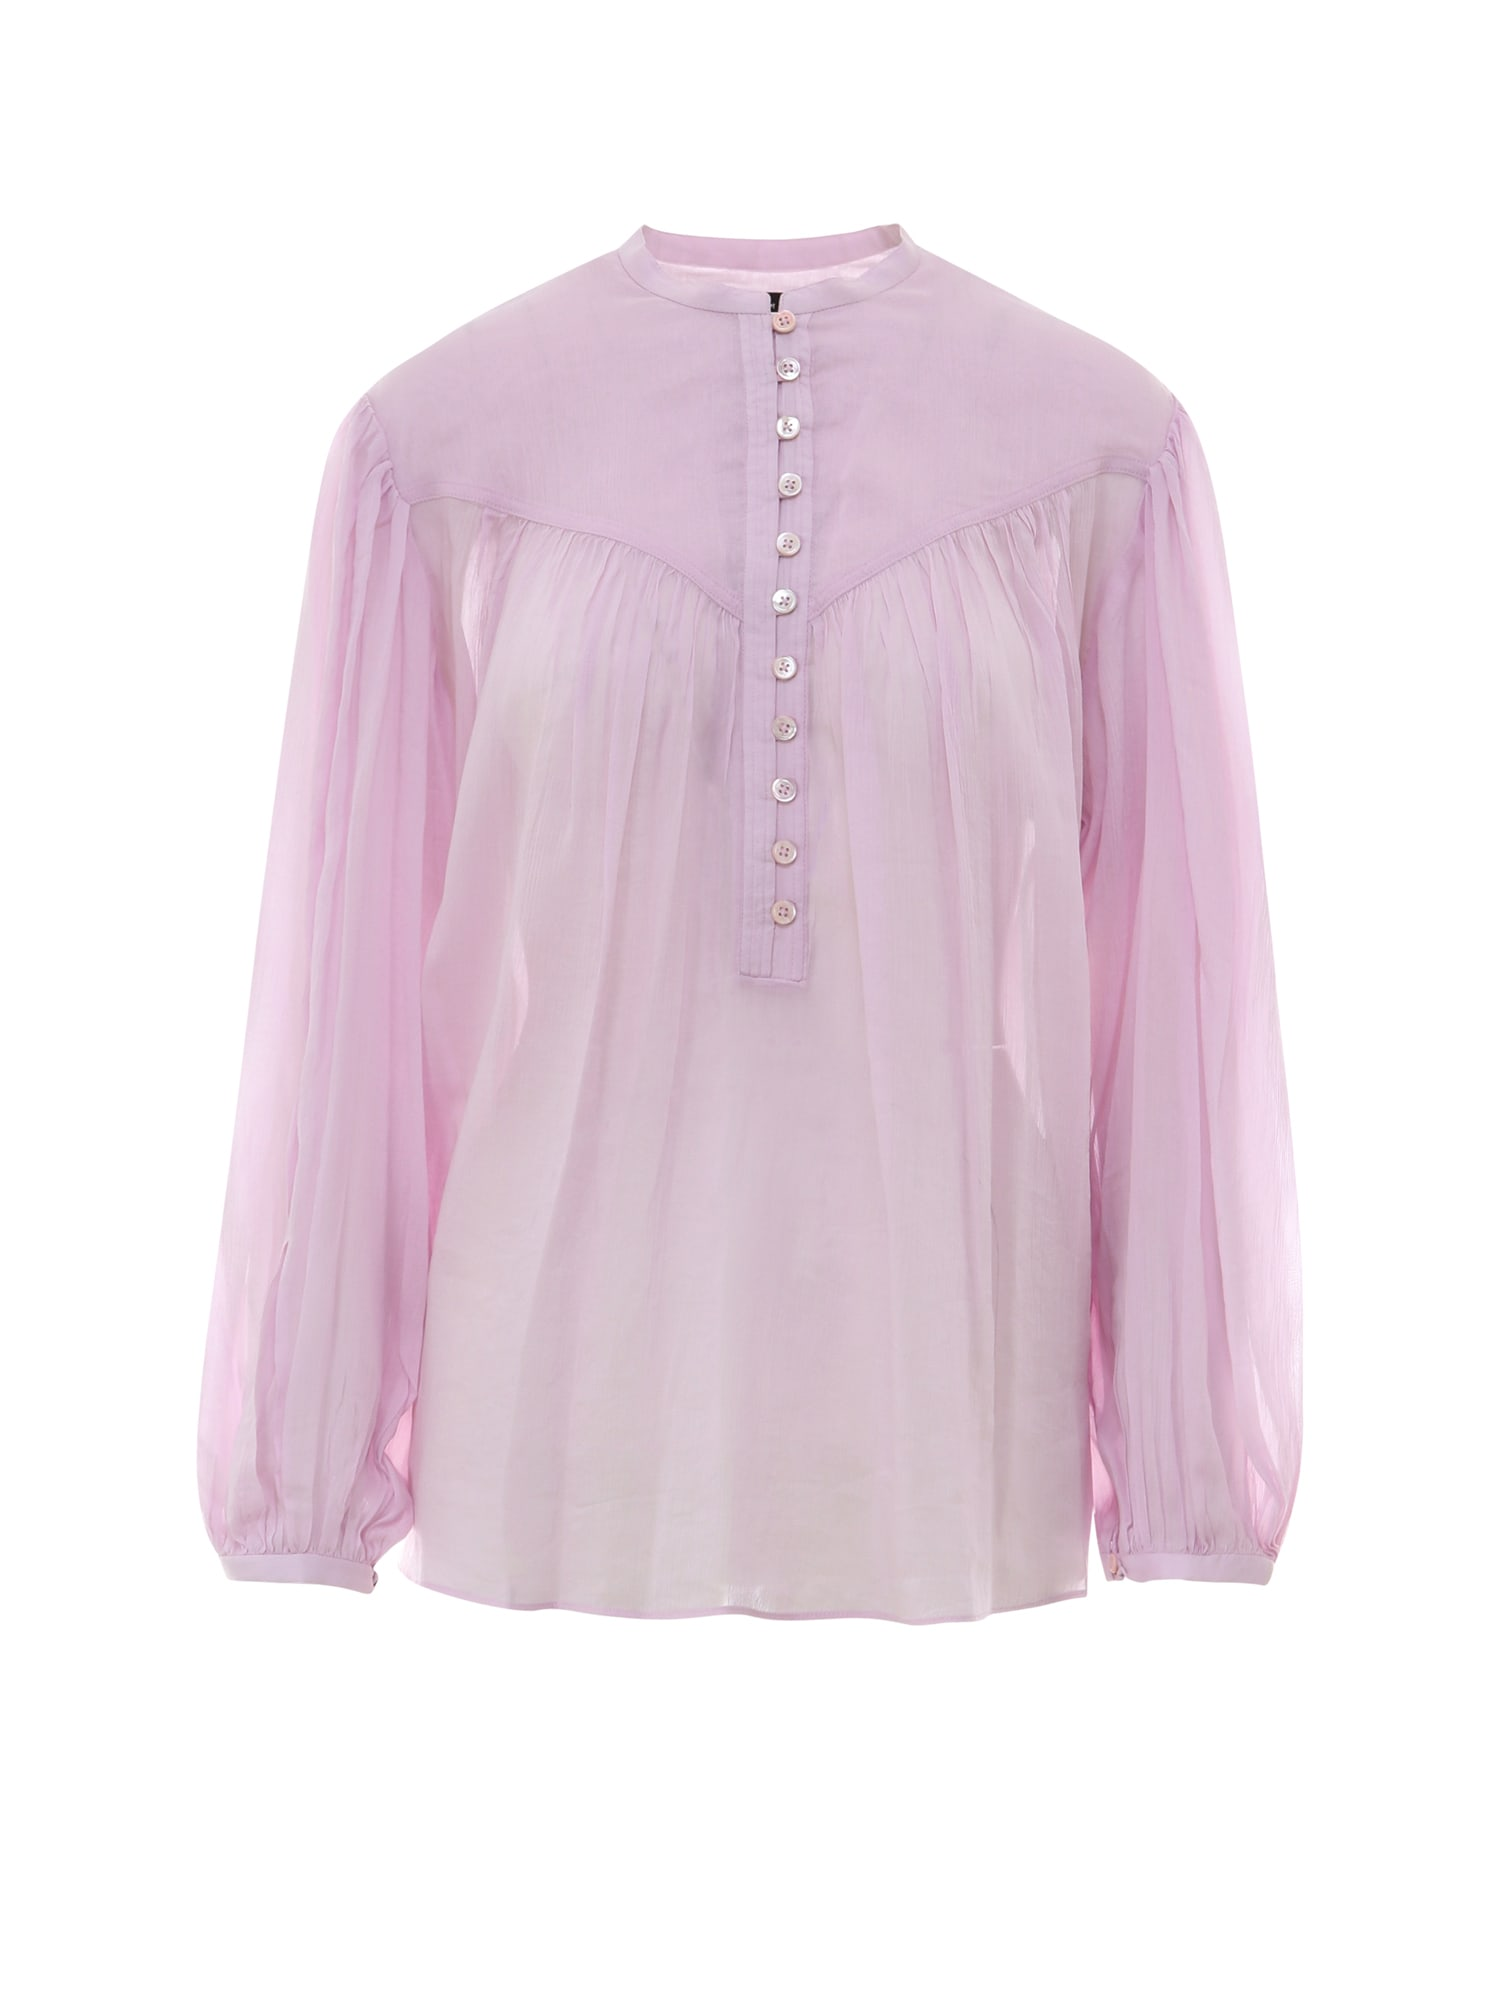 Isabel Marant Cottons SHIRT